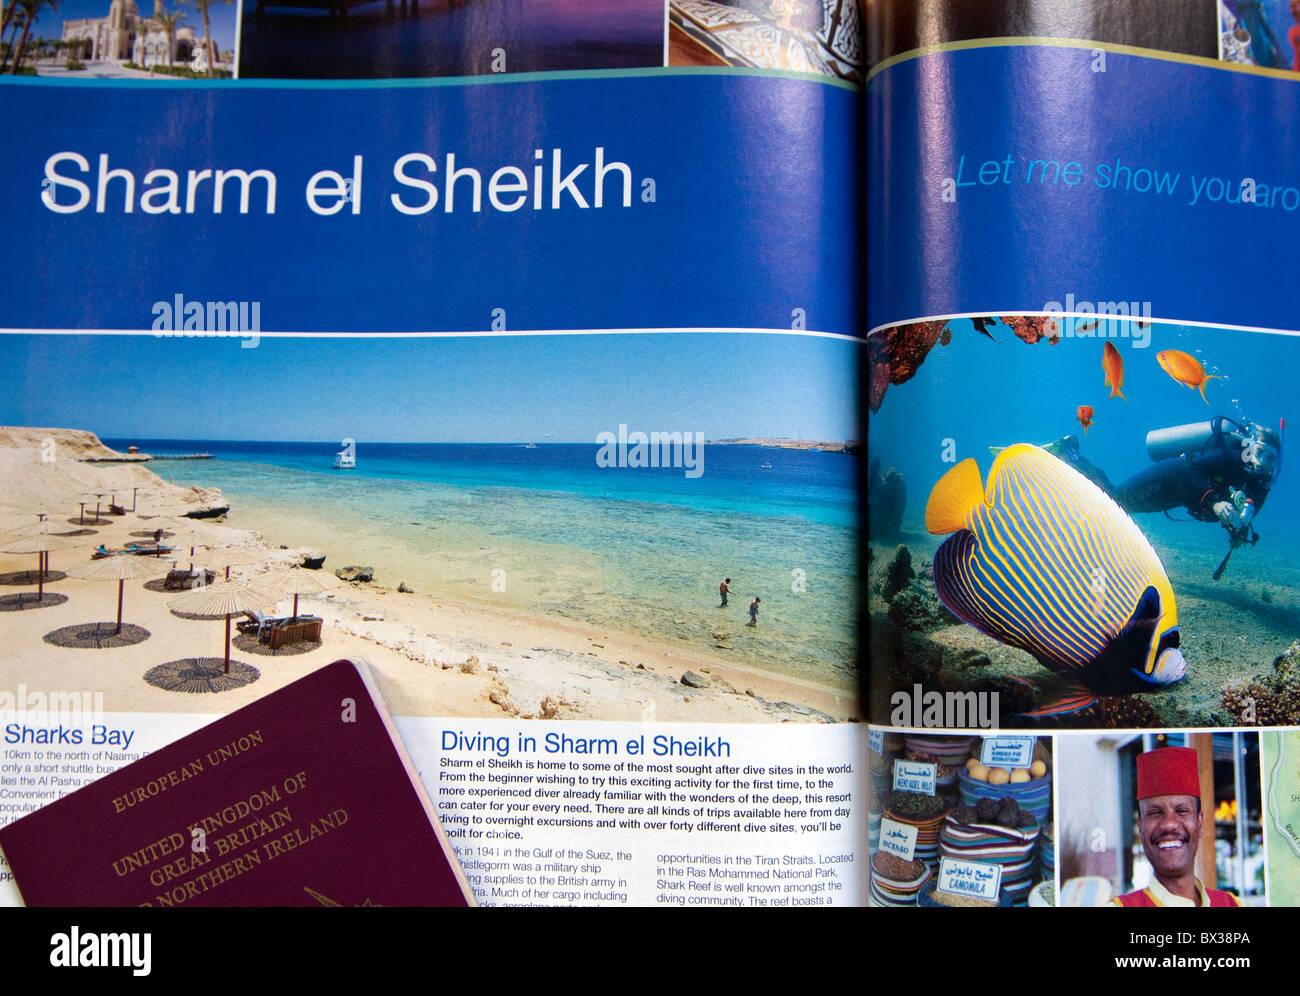 egypt travel brochures